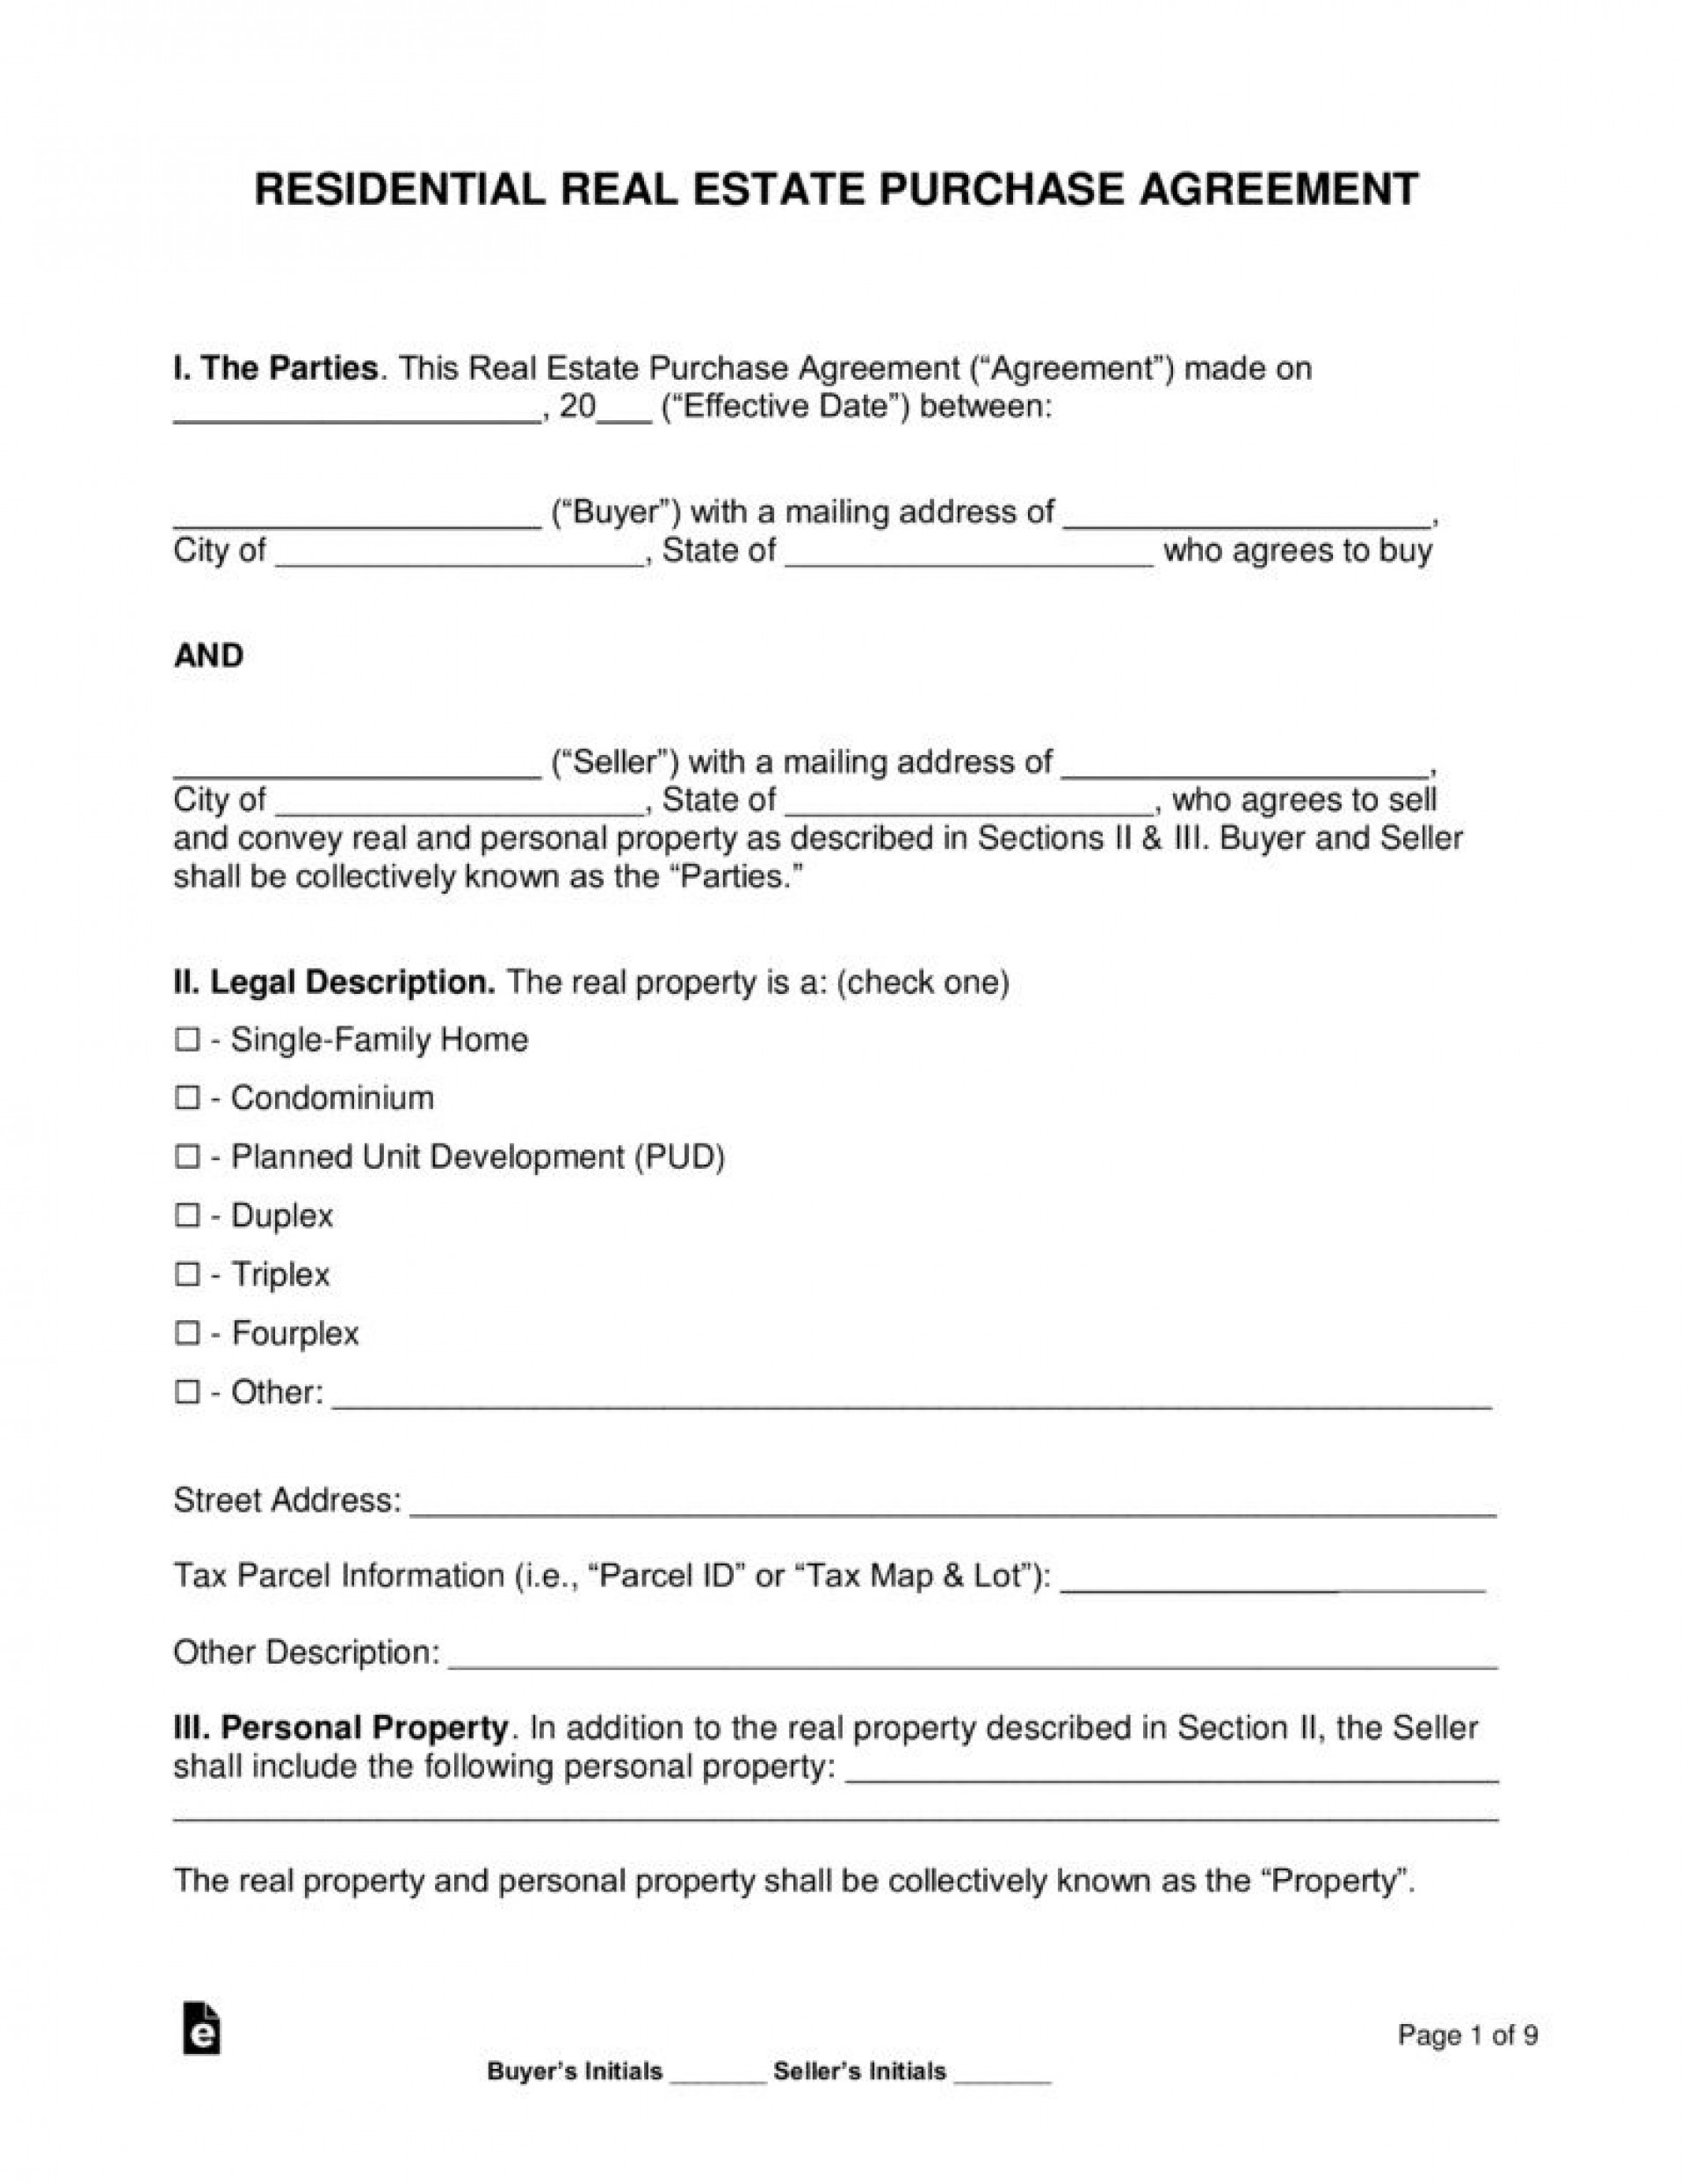 002 Singular Real Estate Purchase Agreement Template Highest Clarity  Contract California Minnesota British Columbia1920